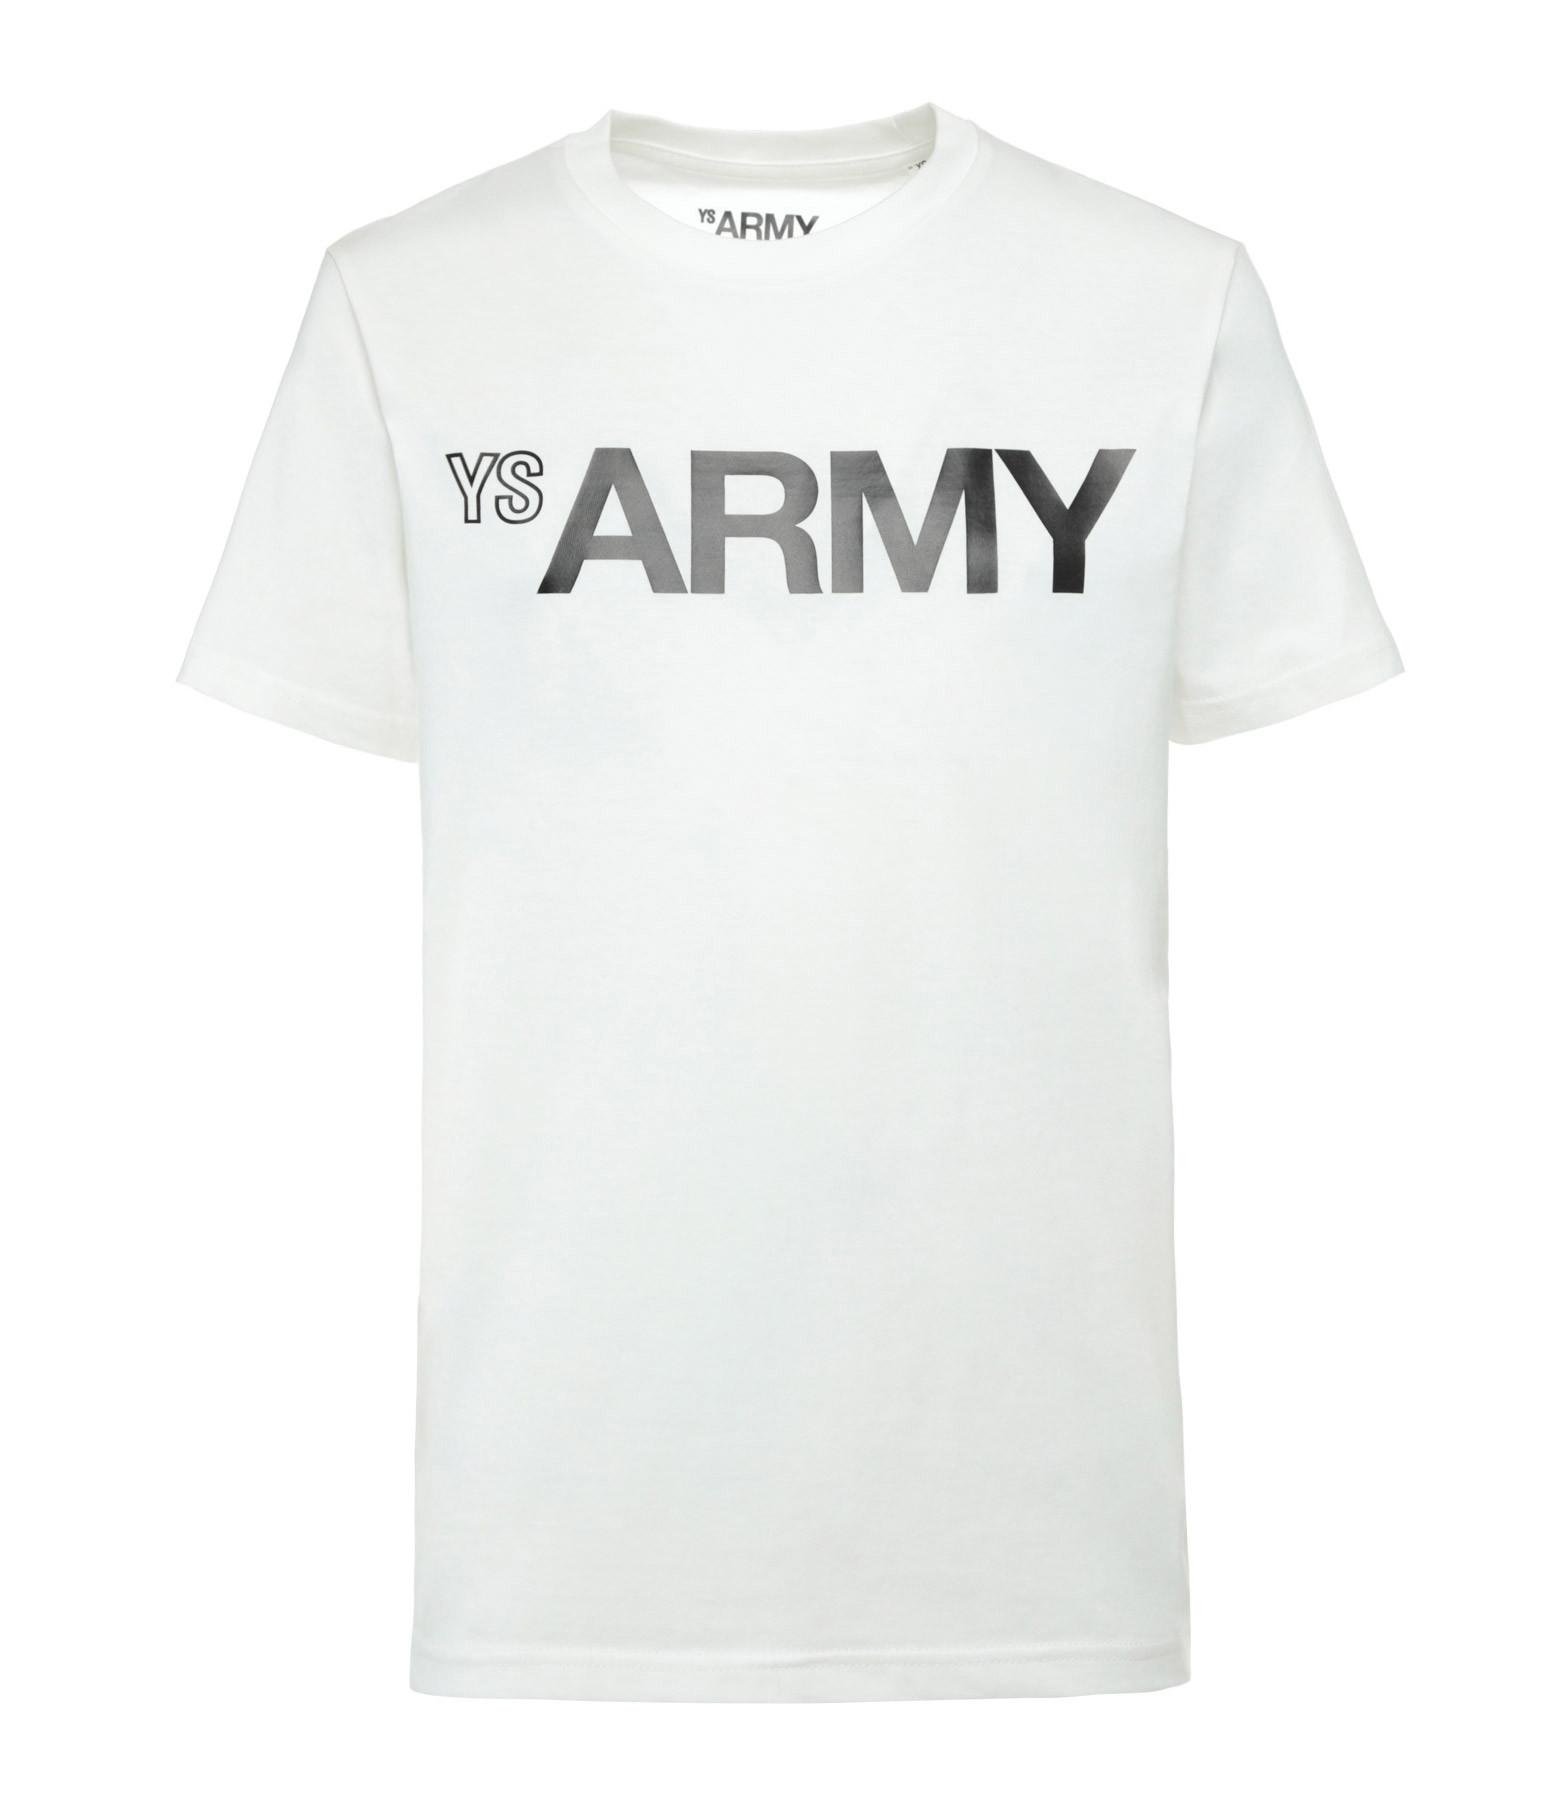 YVES SALOMON - ARMY - Tee-shirt Coton Ivoire